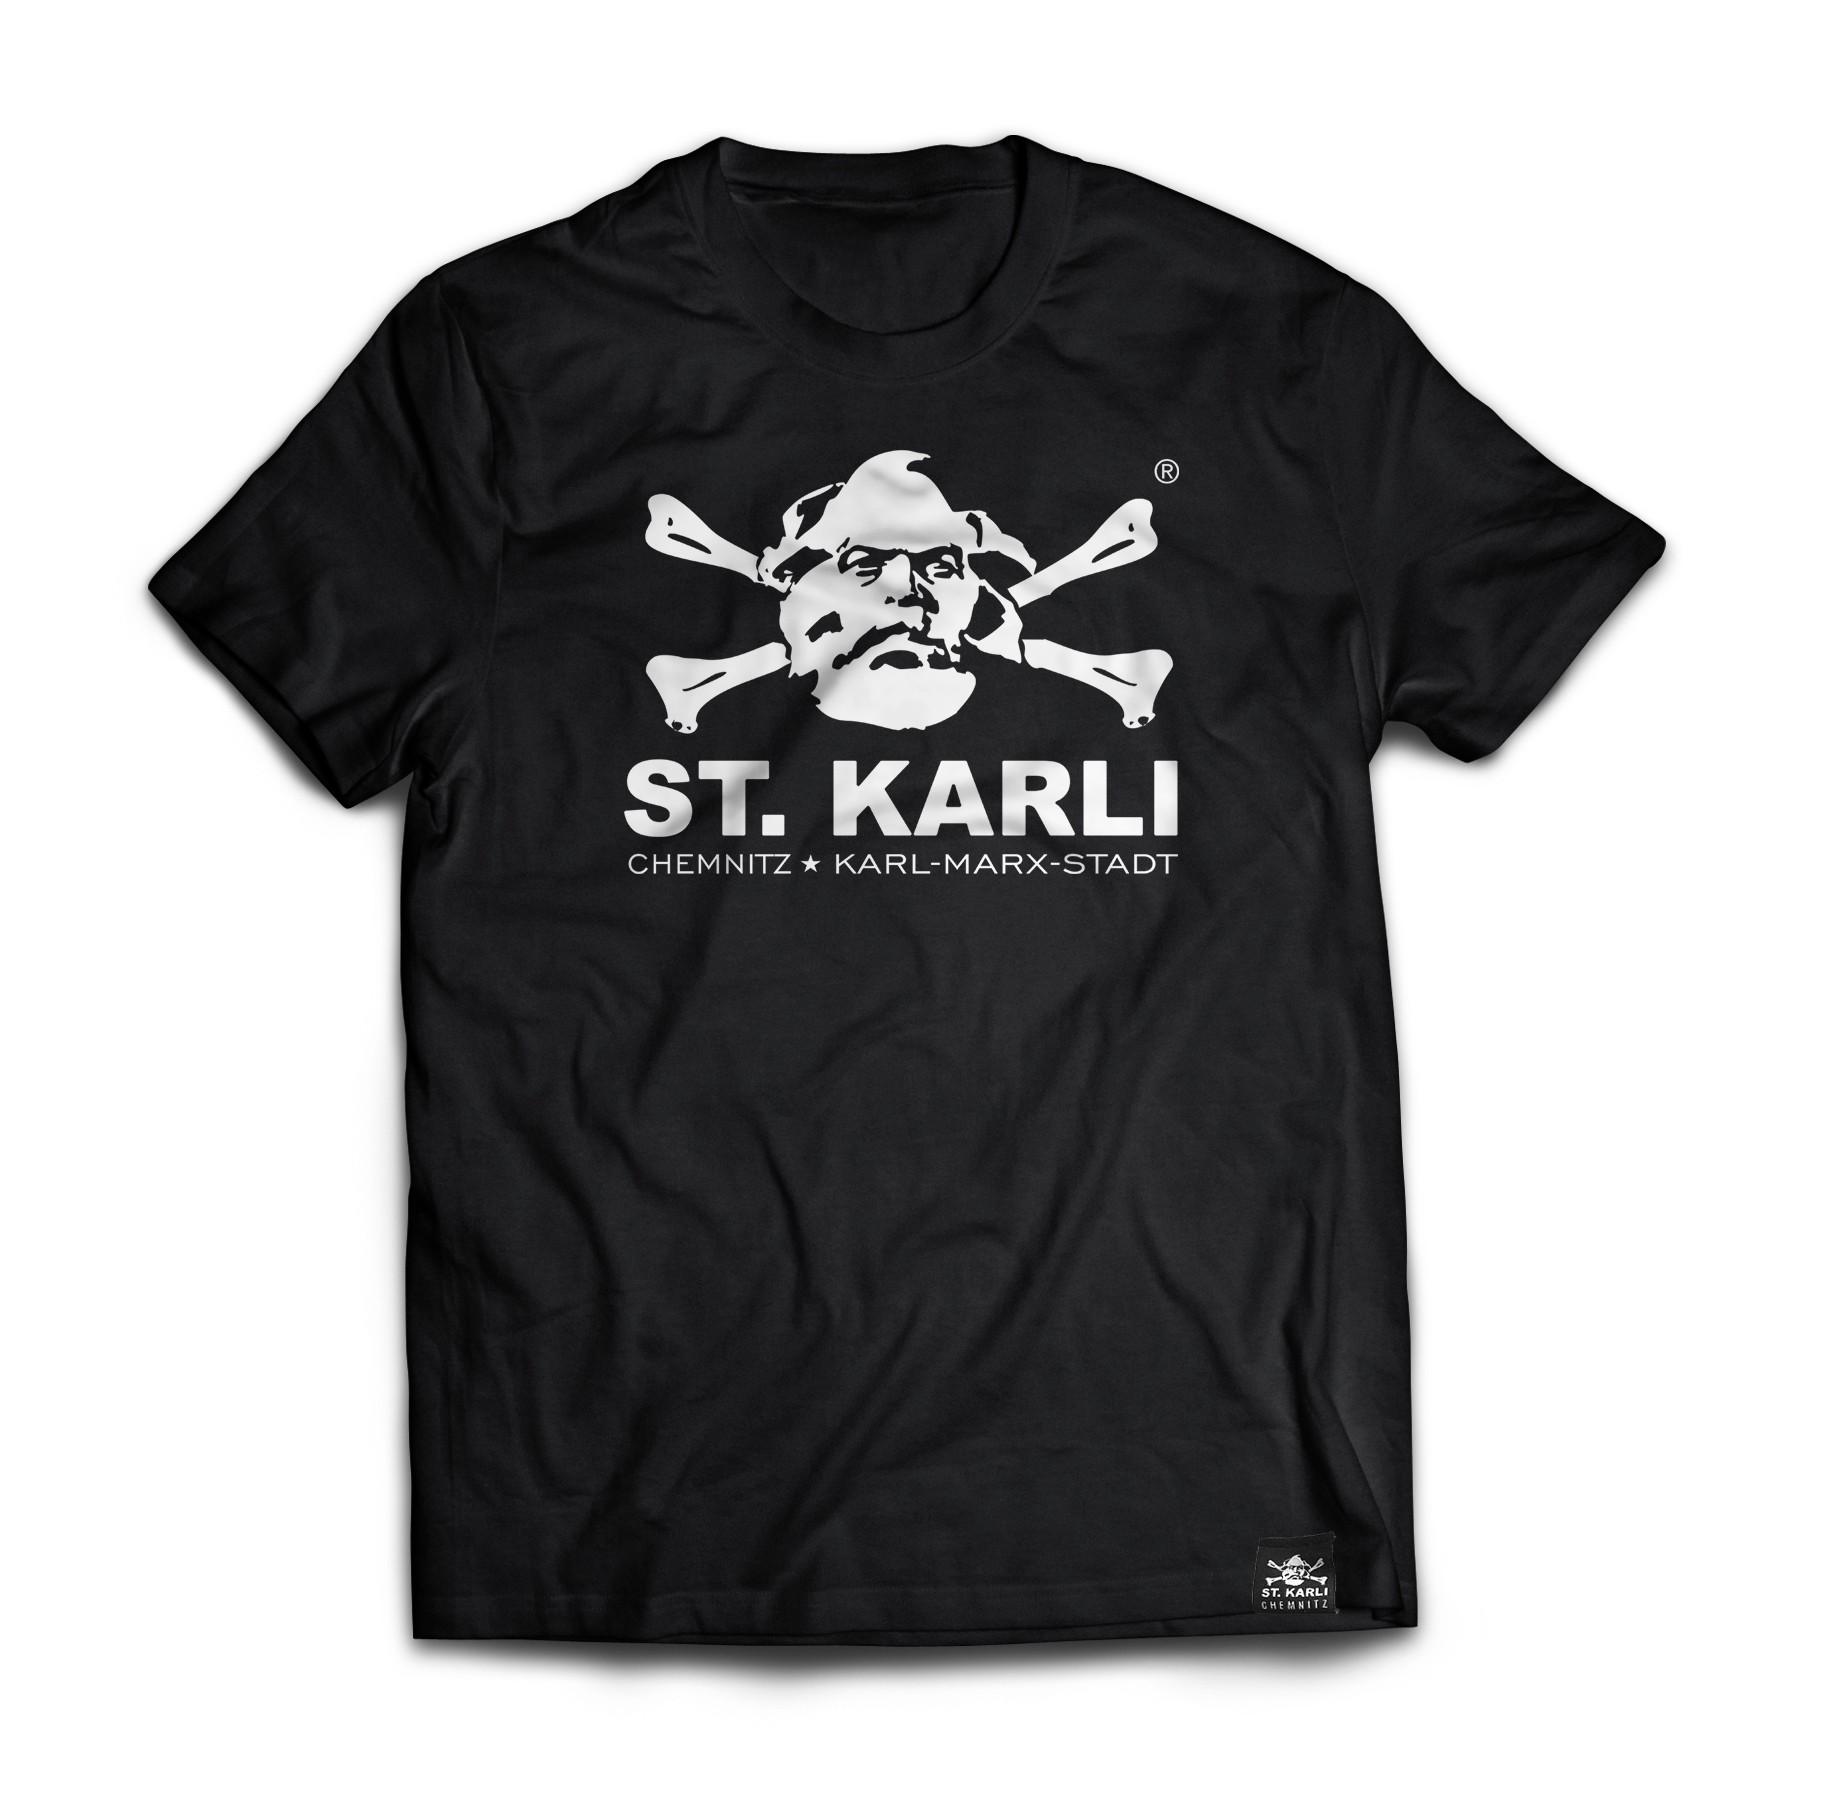 ST. KARLI  Herren T-Shirt